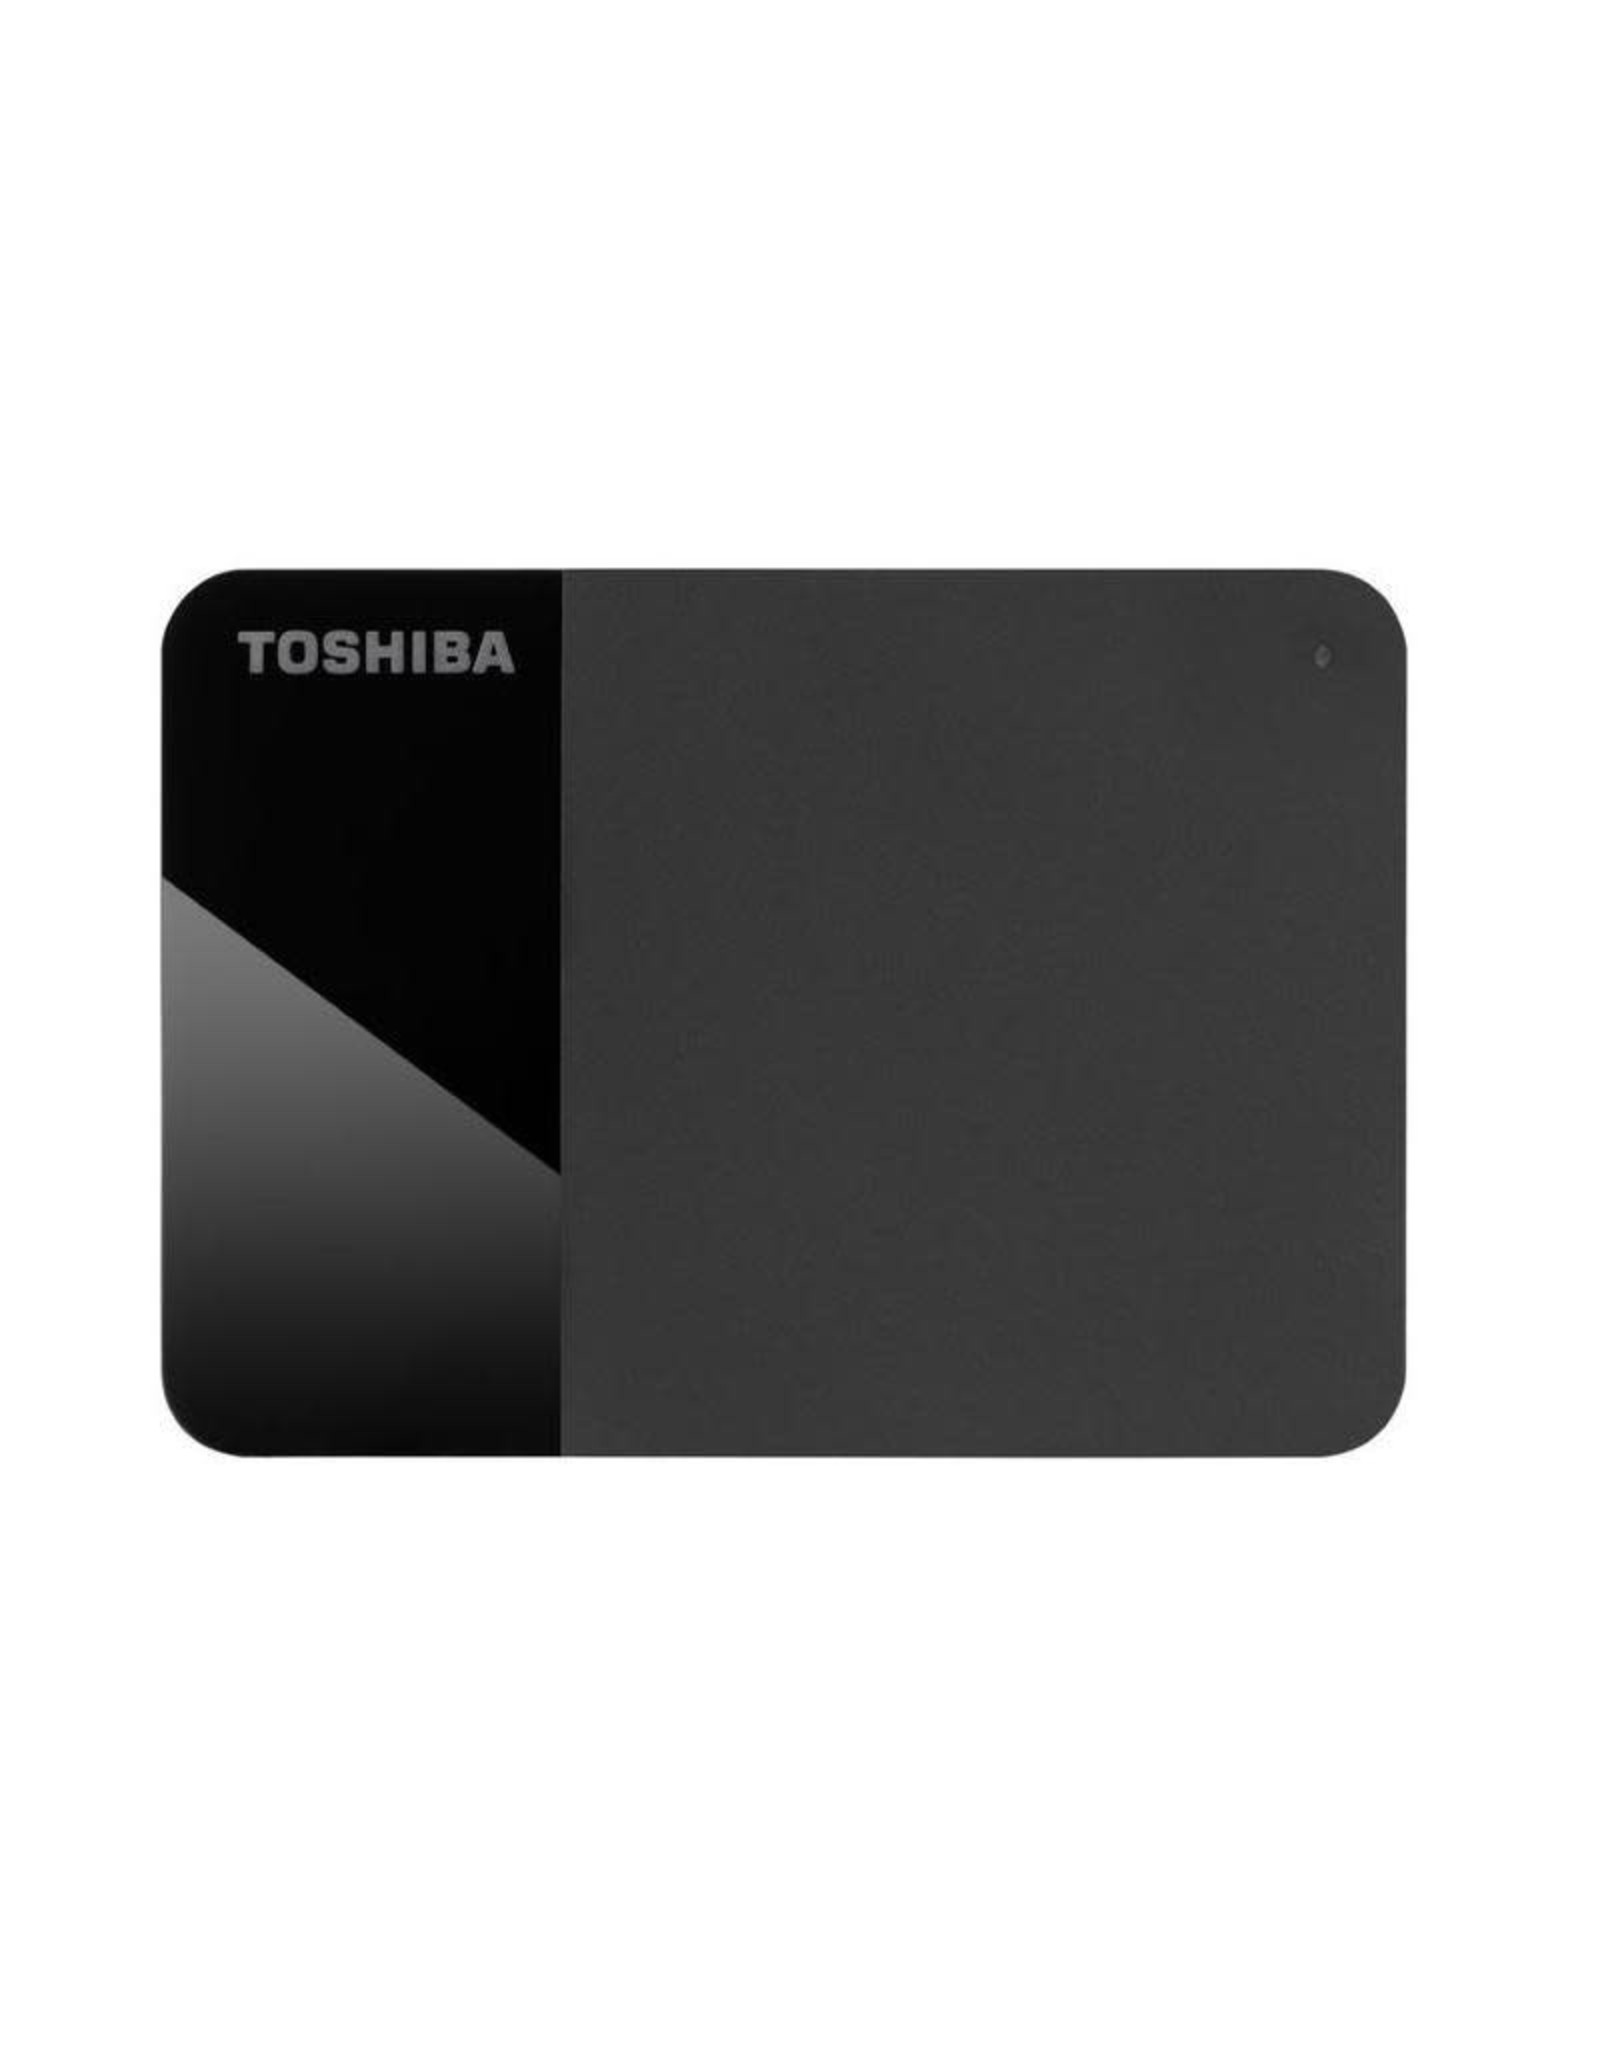 Toshiba CANVIO Ready Portable External Hard Drive, USB 3.0, 2TB, Black